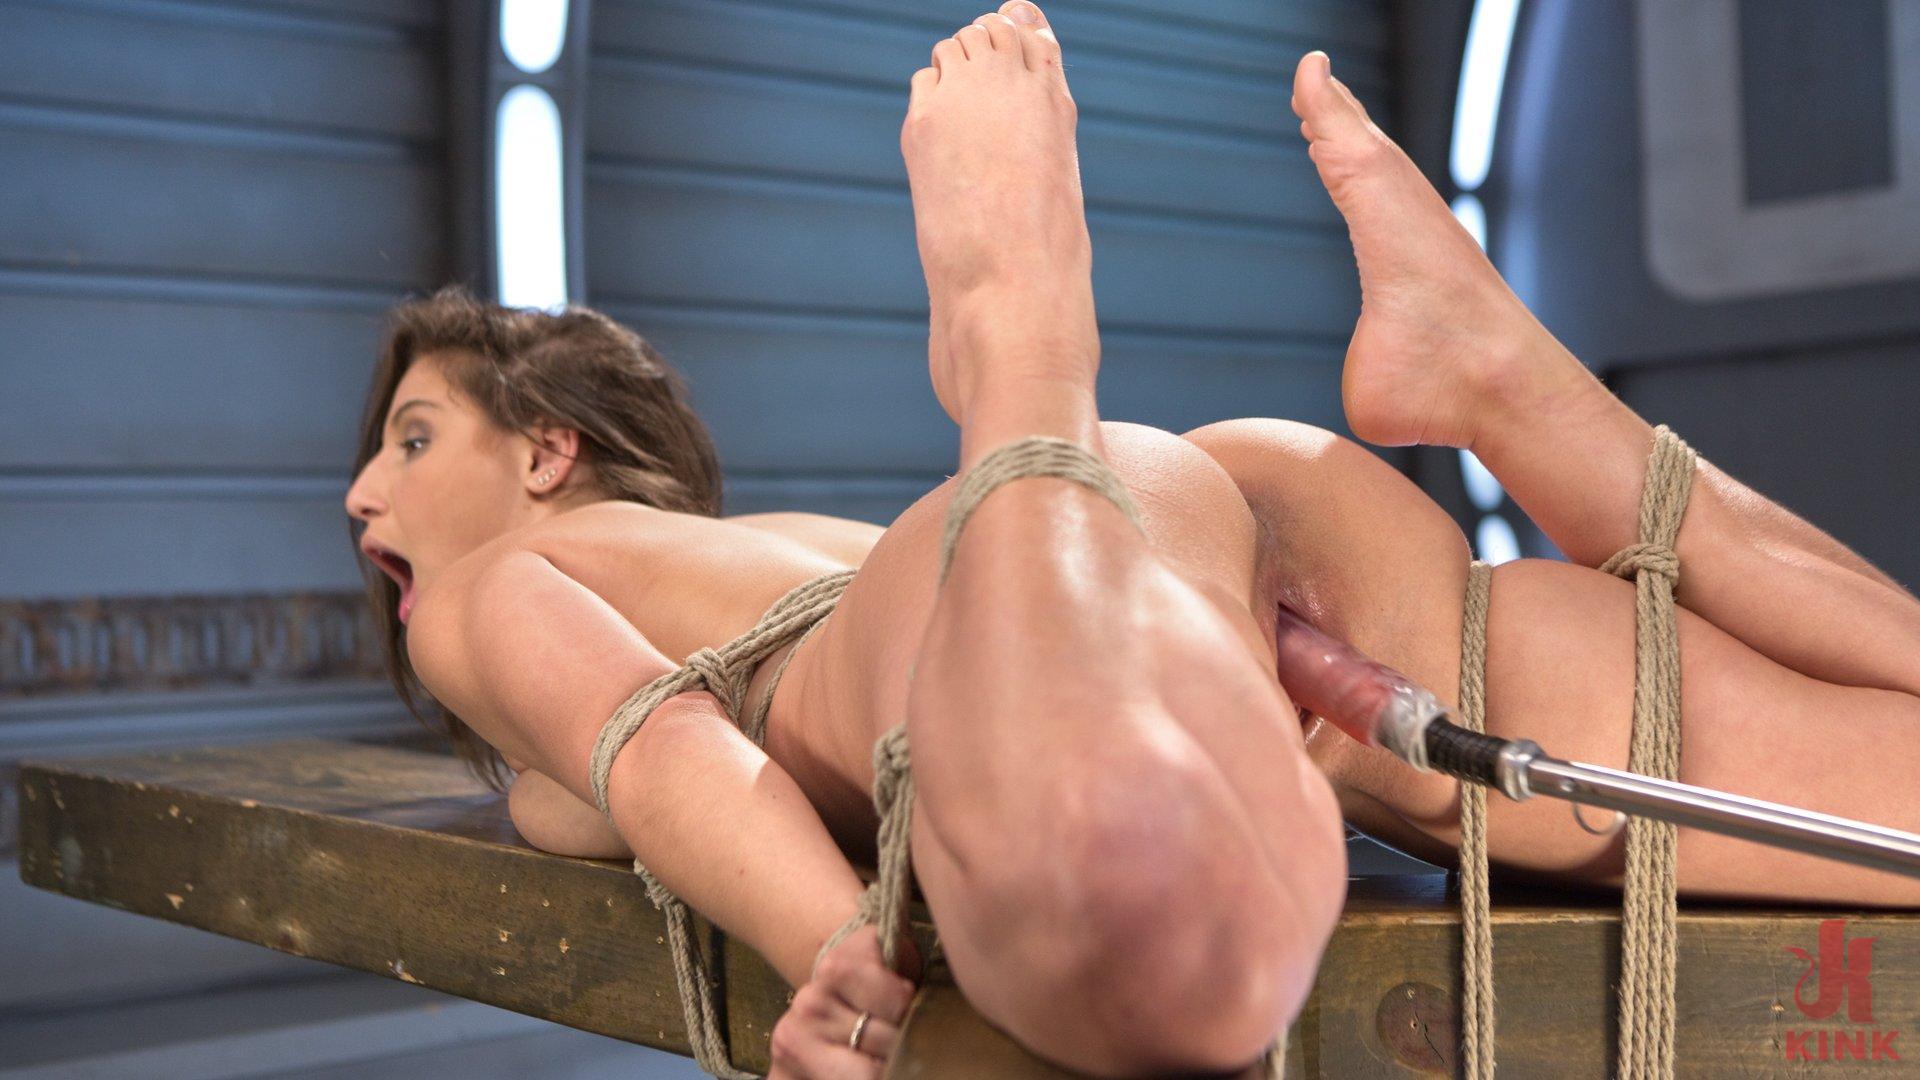 Photo number 5 from Bondage Slut Gets Fucked Senseless in Rope Bondage shot for Fucking Machines on Kink.com. Featuring Abella Danger in hardcore BDSM & Fetish porn.